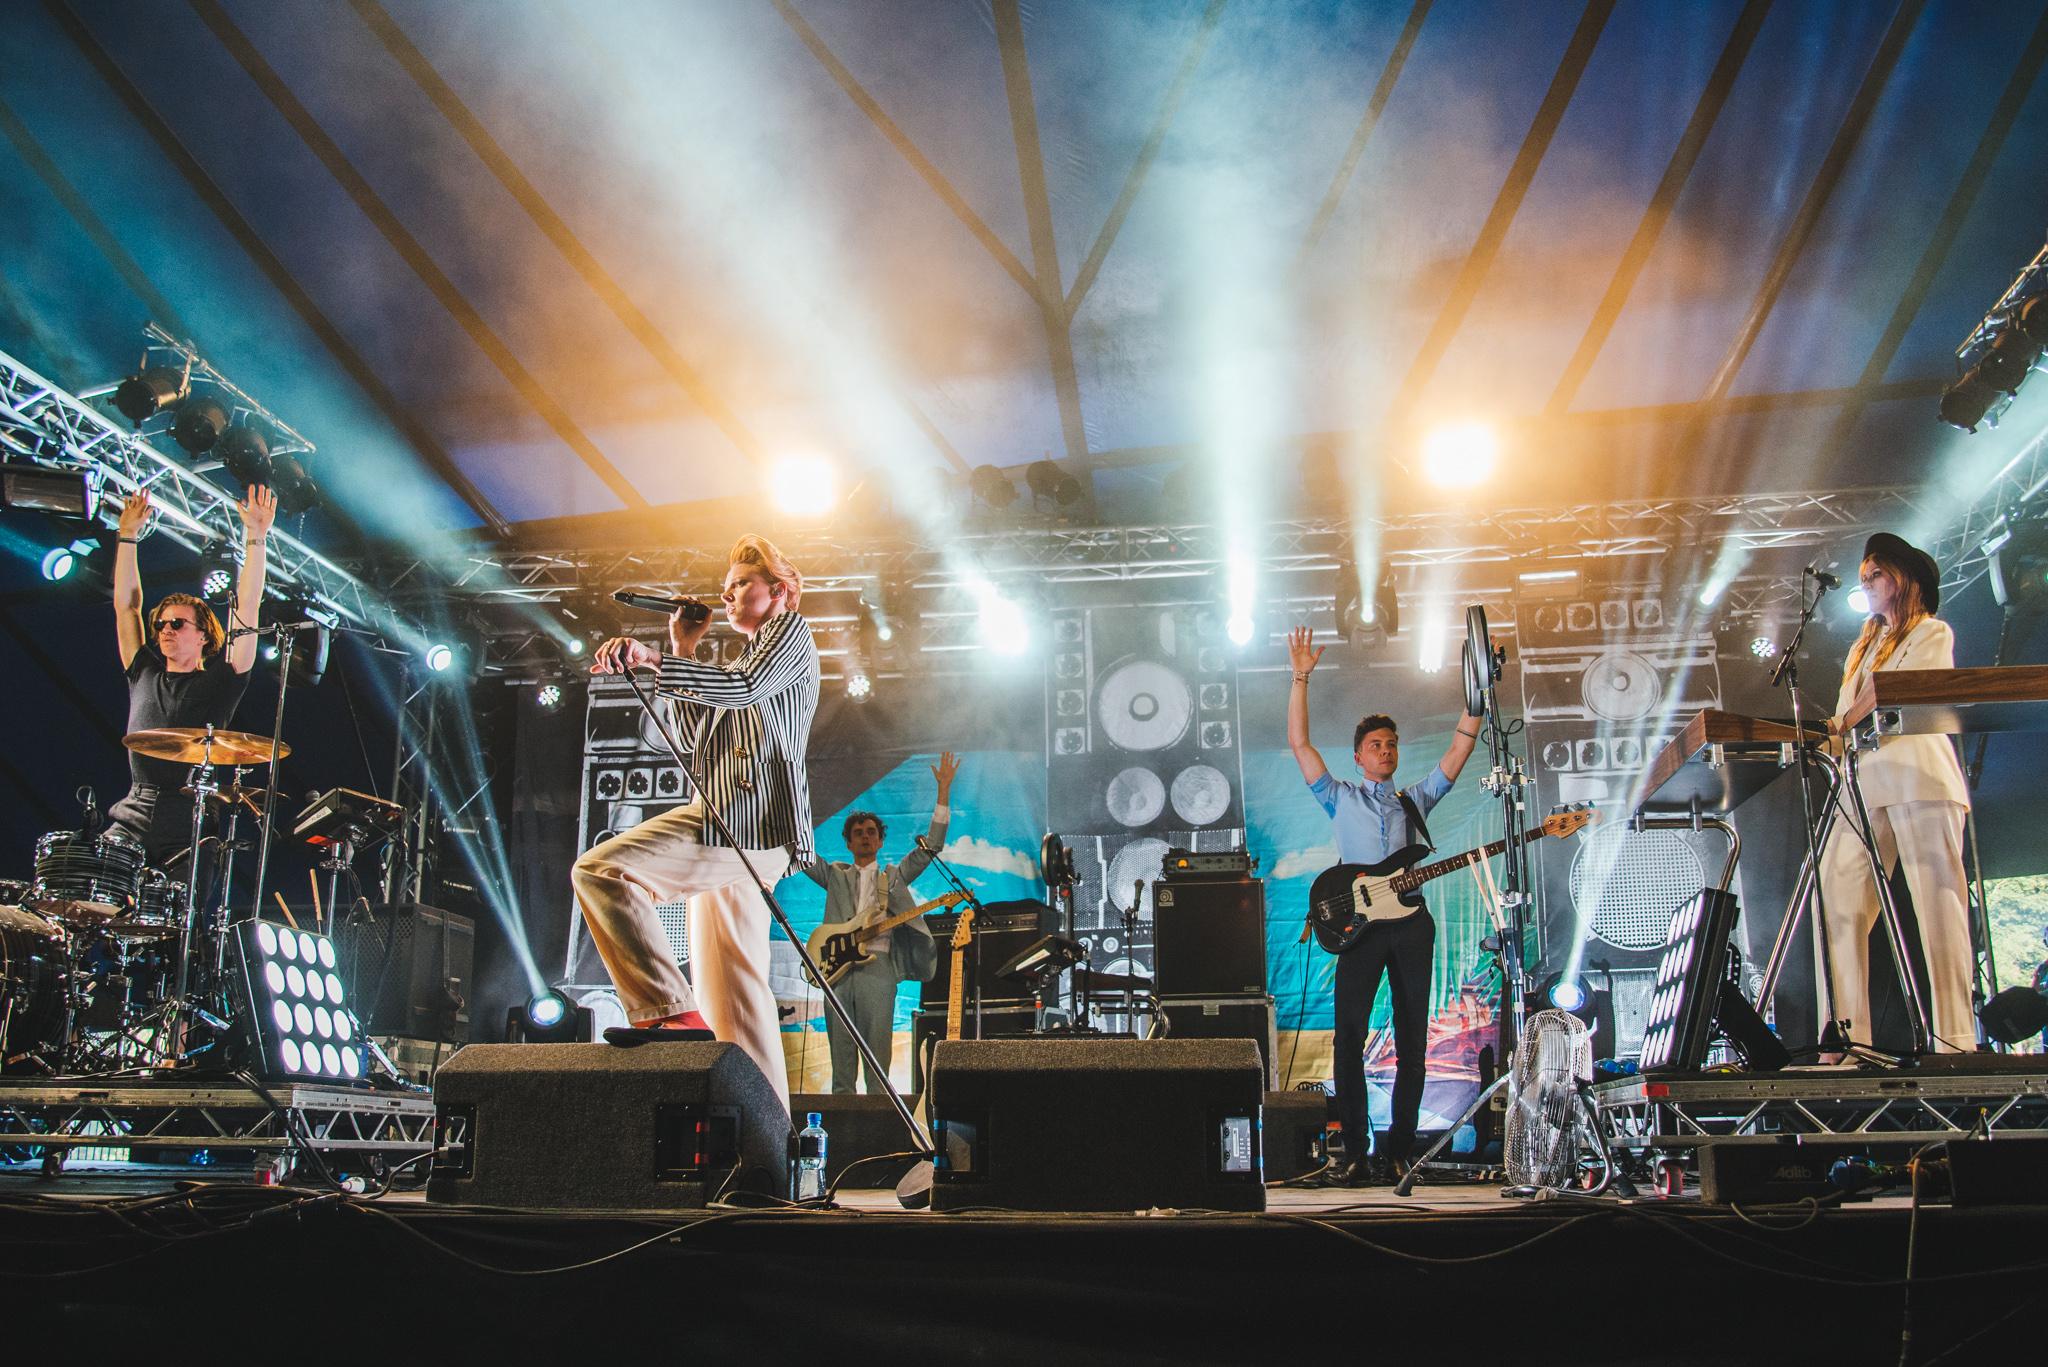 La Roux gives electro-pop a striking edge at Latitude 2015